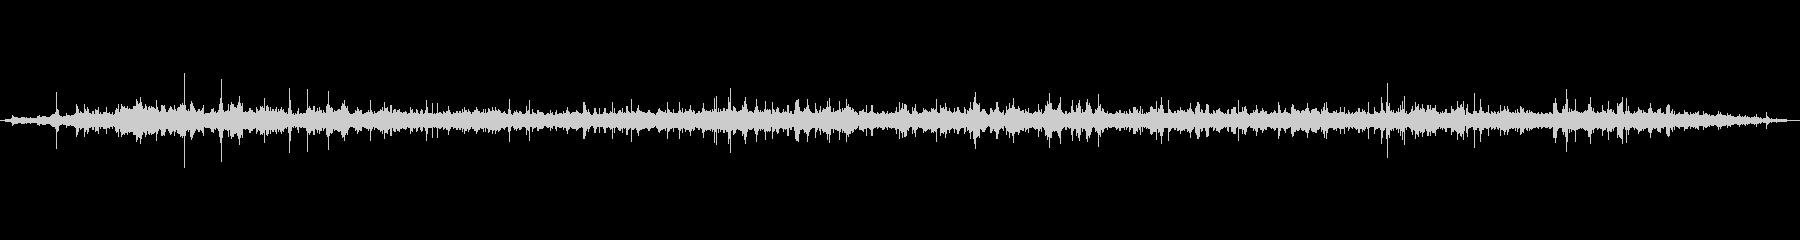 [ASMR]波打ち際の音_009の未再生の波形